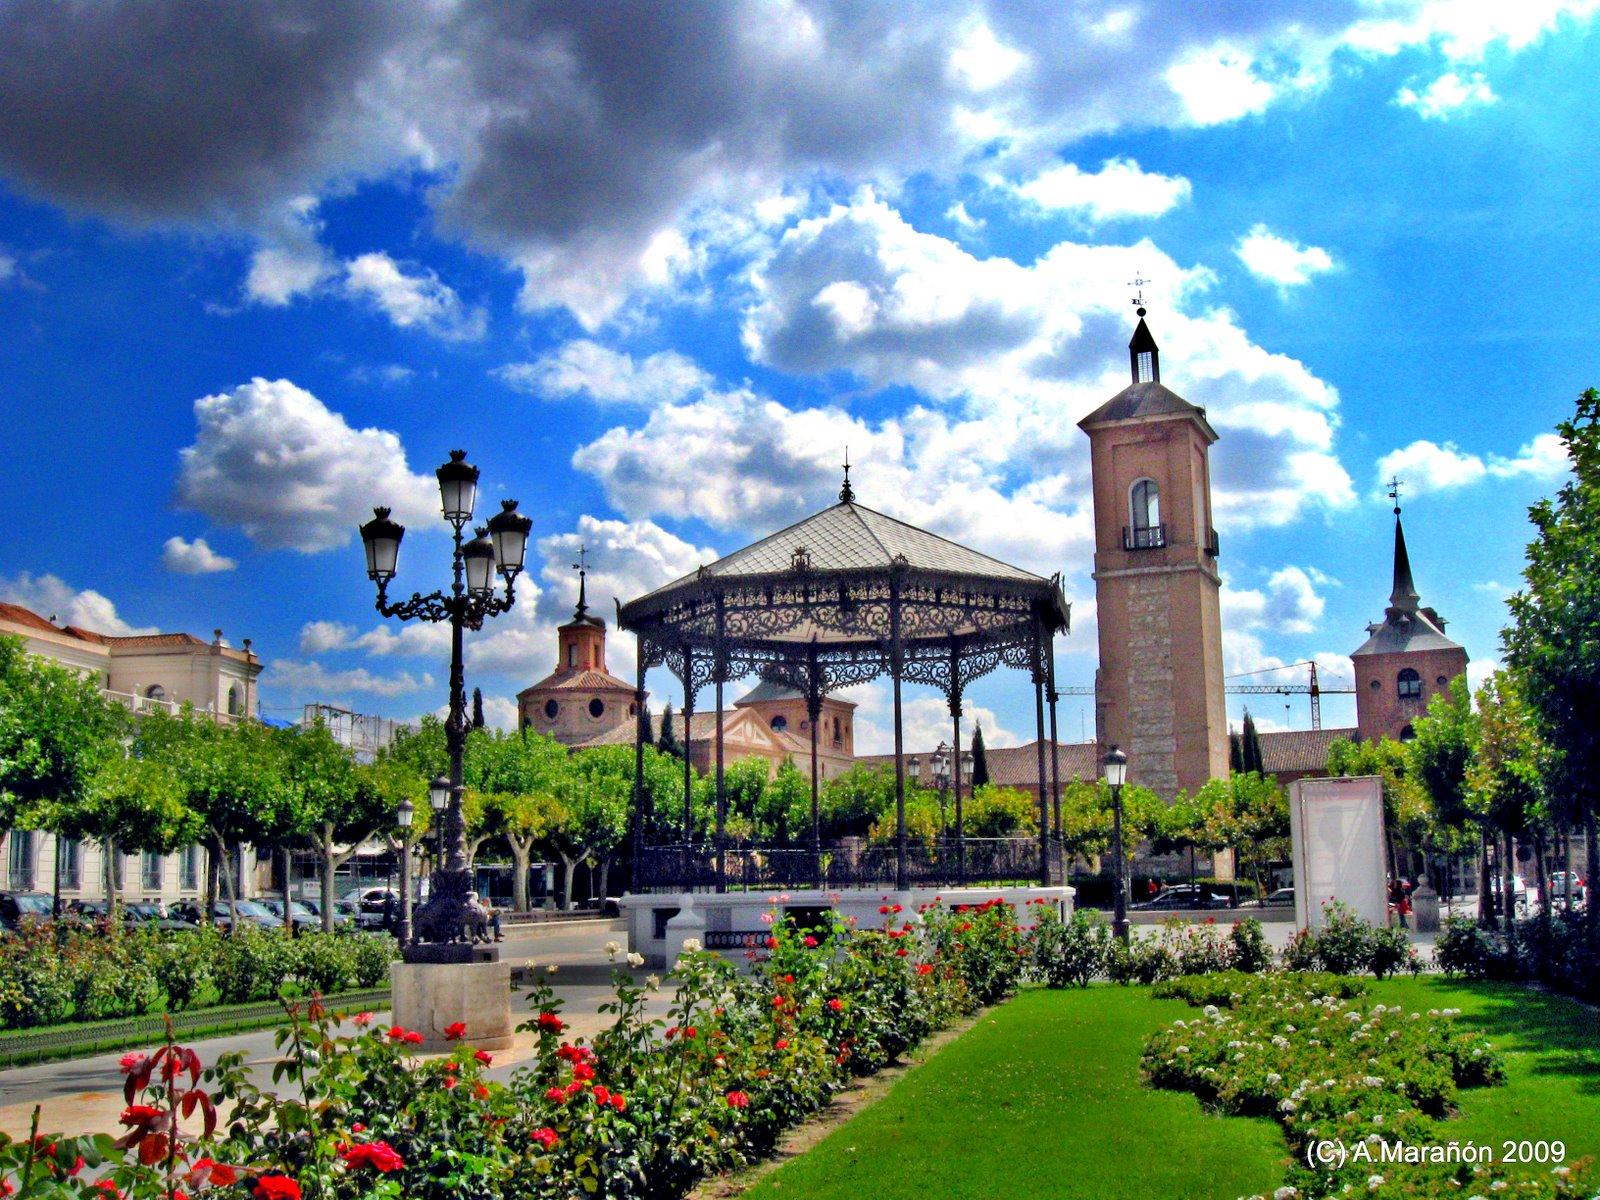 Alcala de henares spain pictures and videos and news - Pintores alcala de henares ...